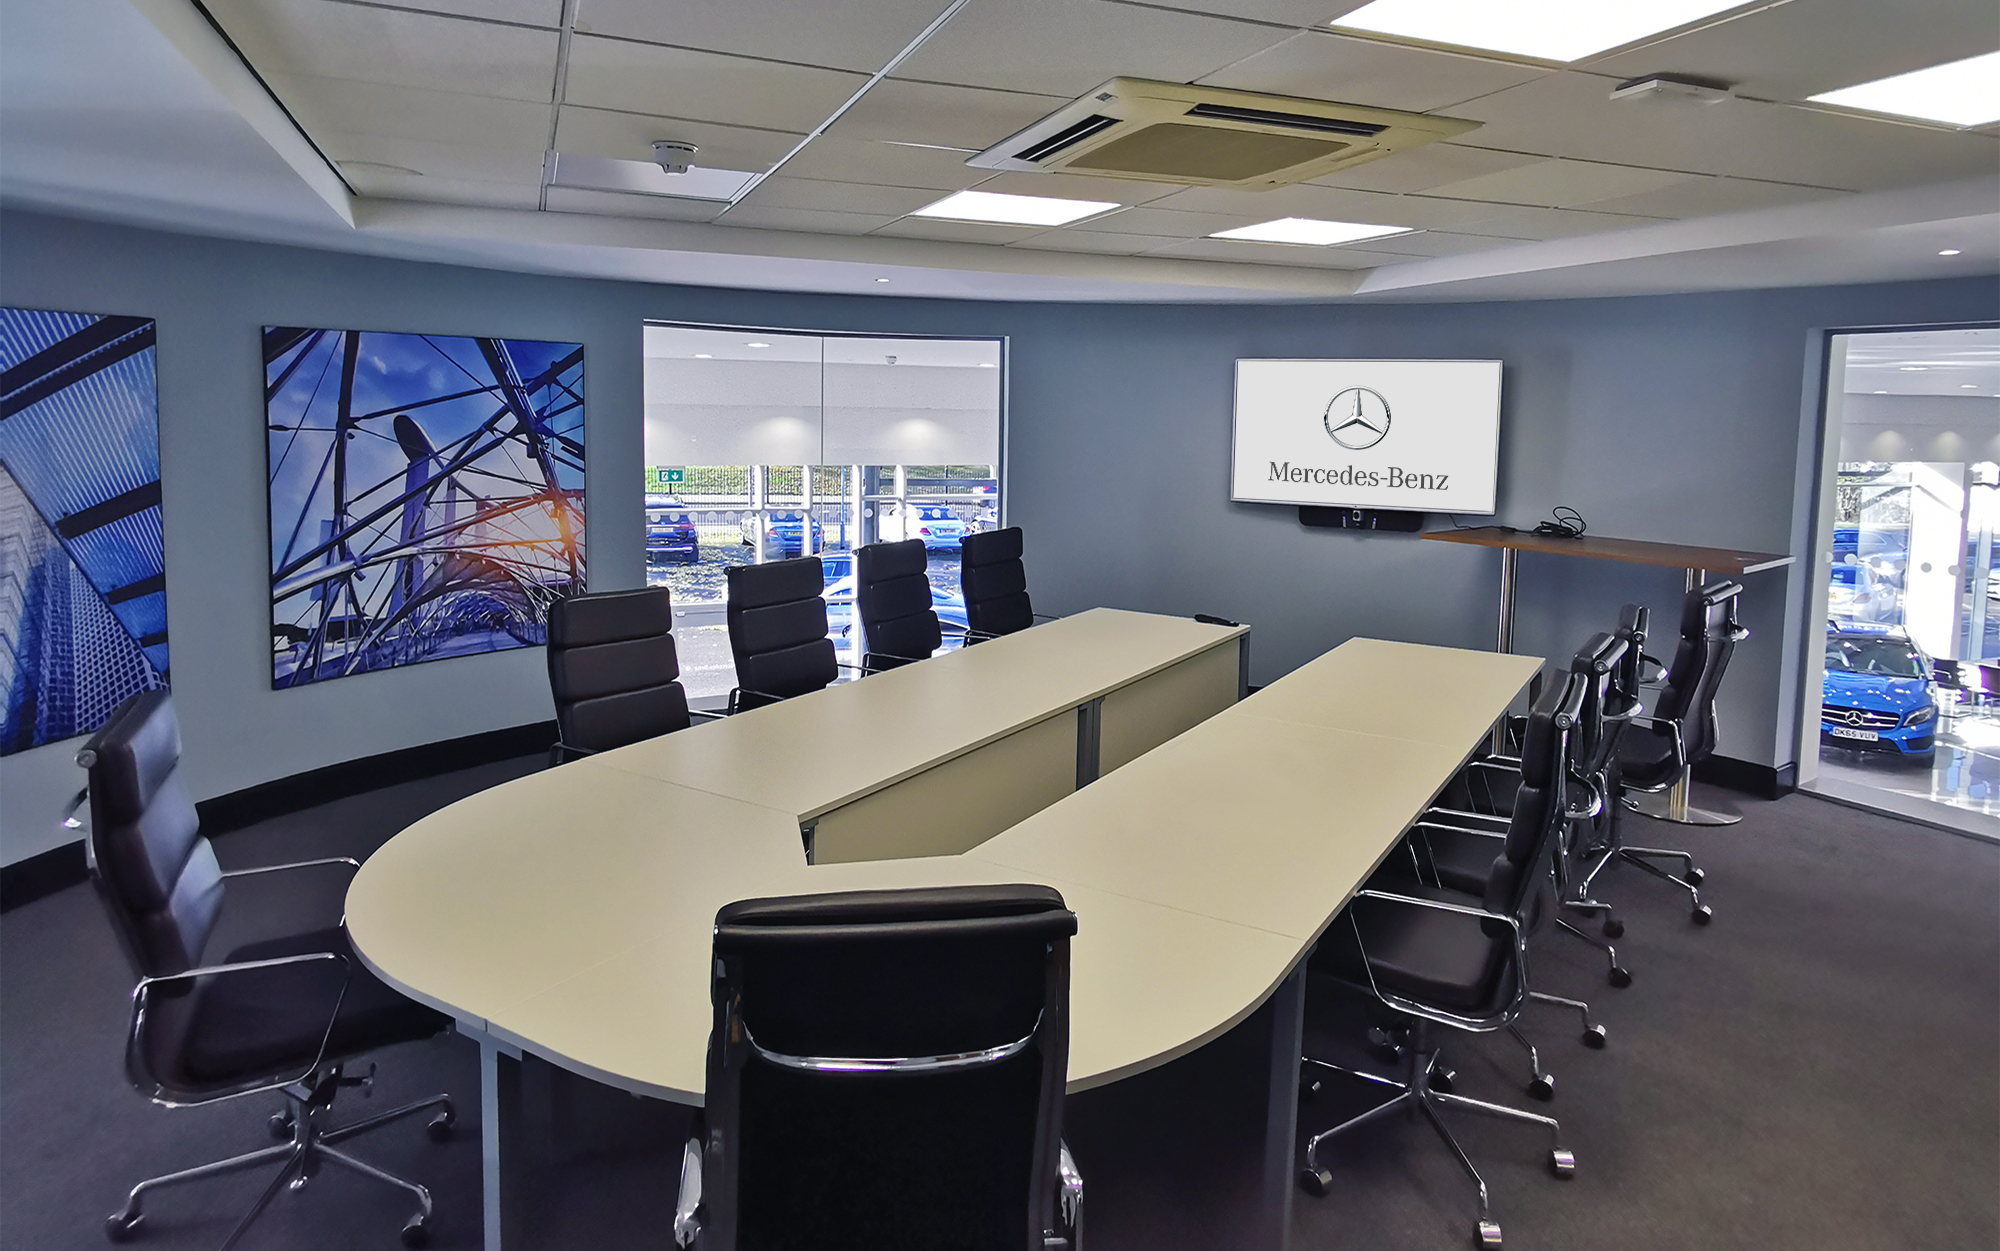 LSH Property Conference Room Upgrade